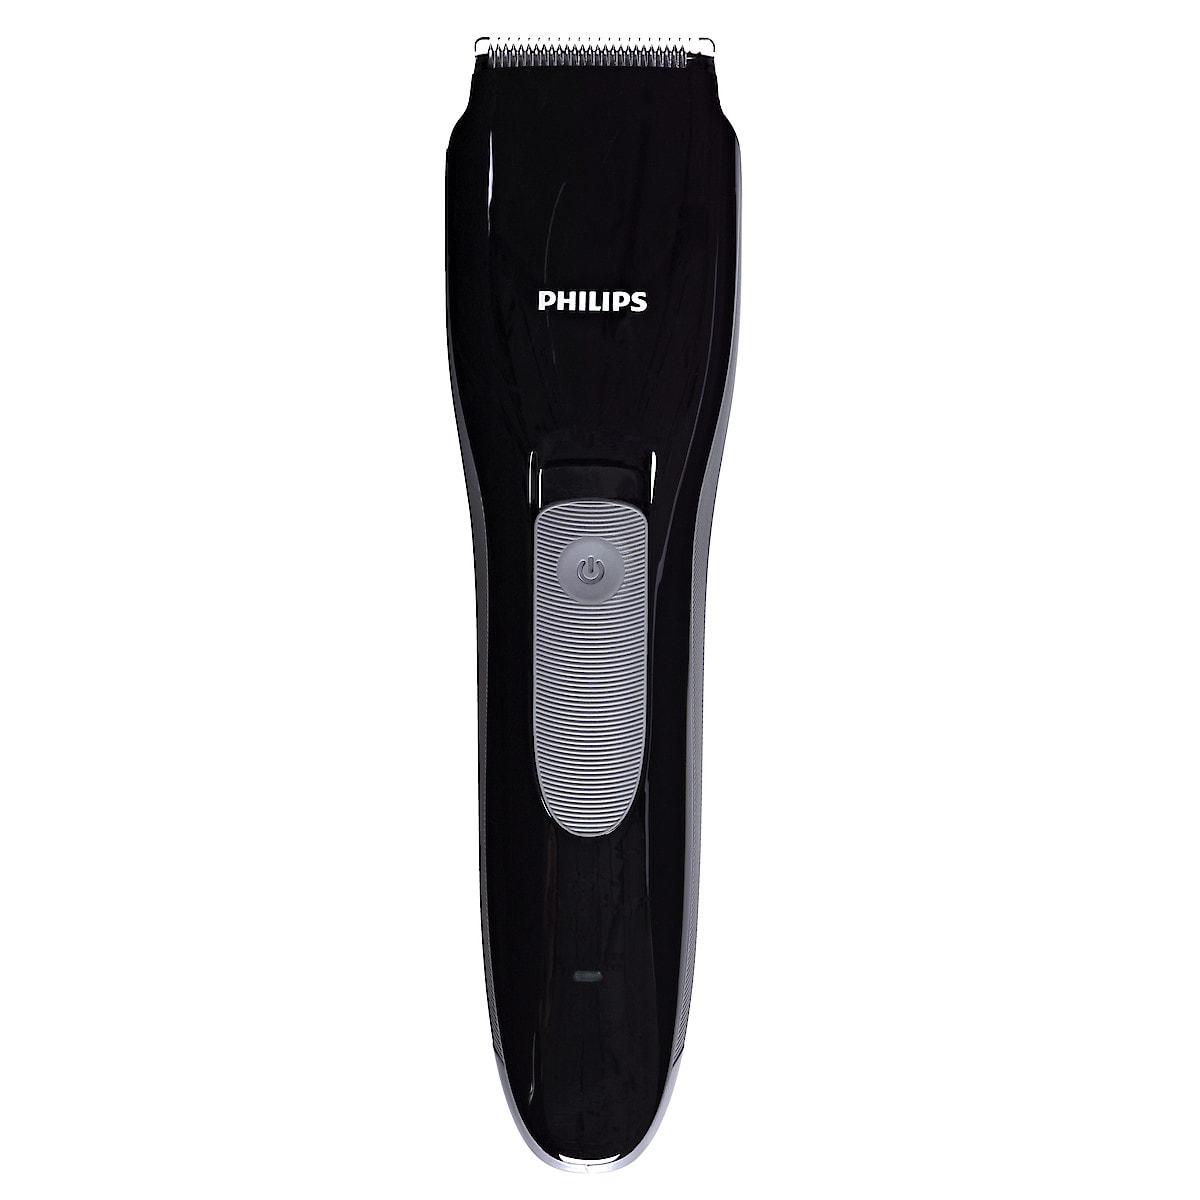 Philips QC5335 hårklipper